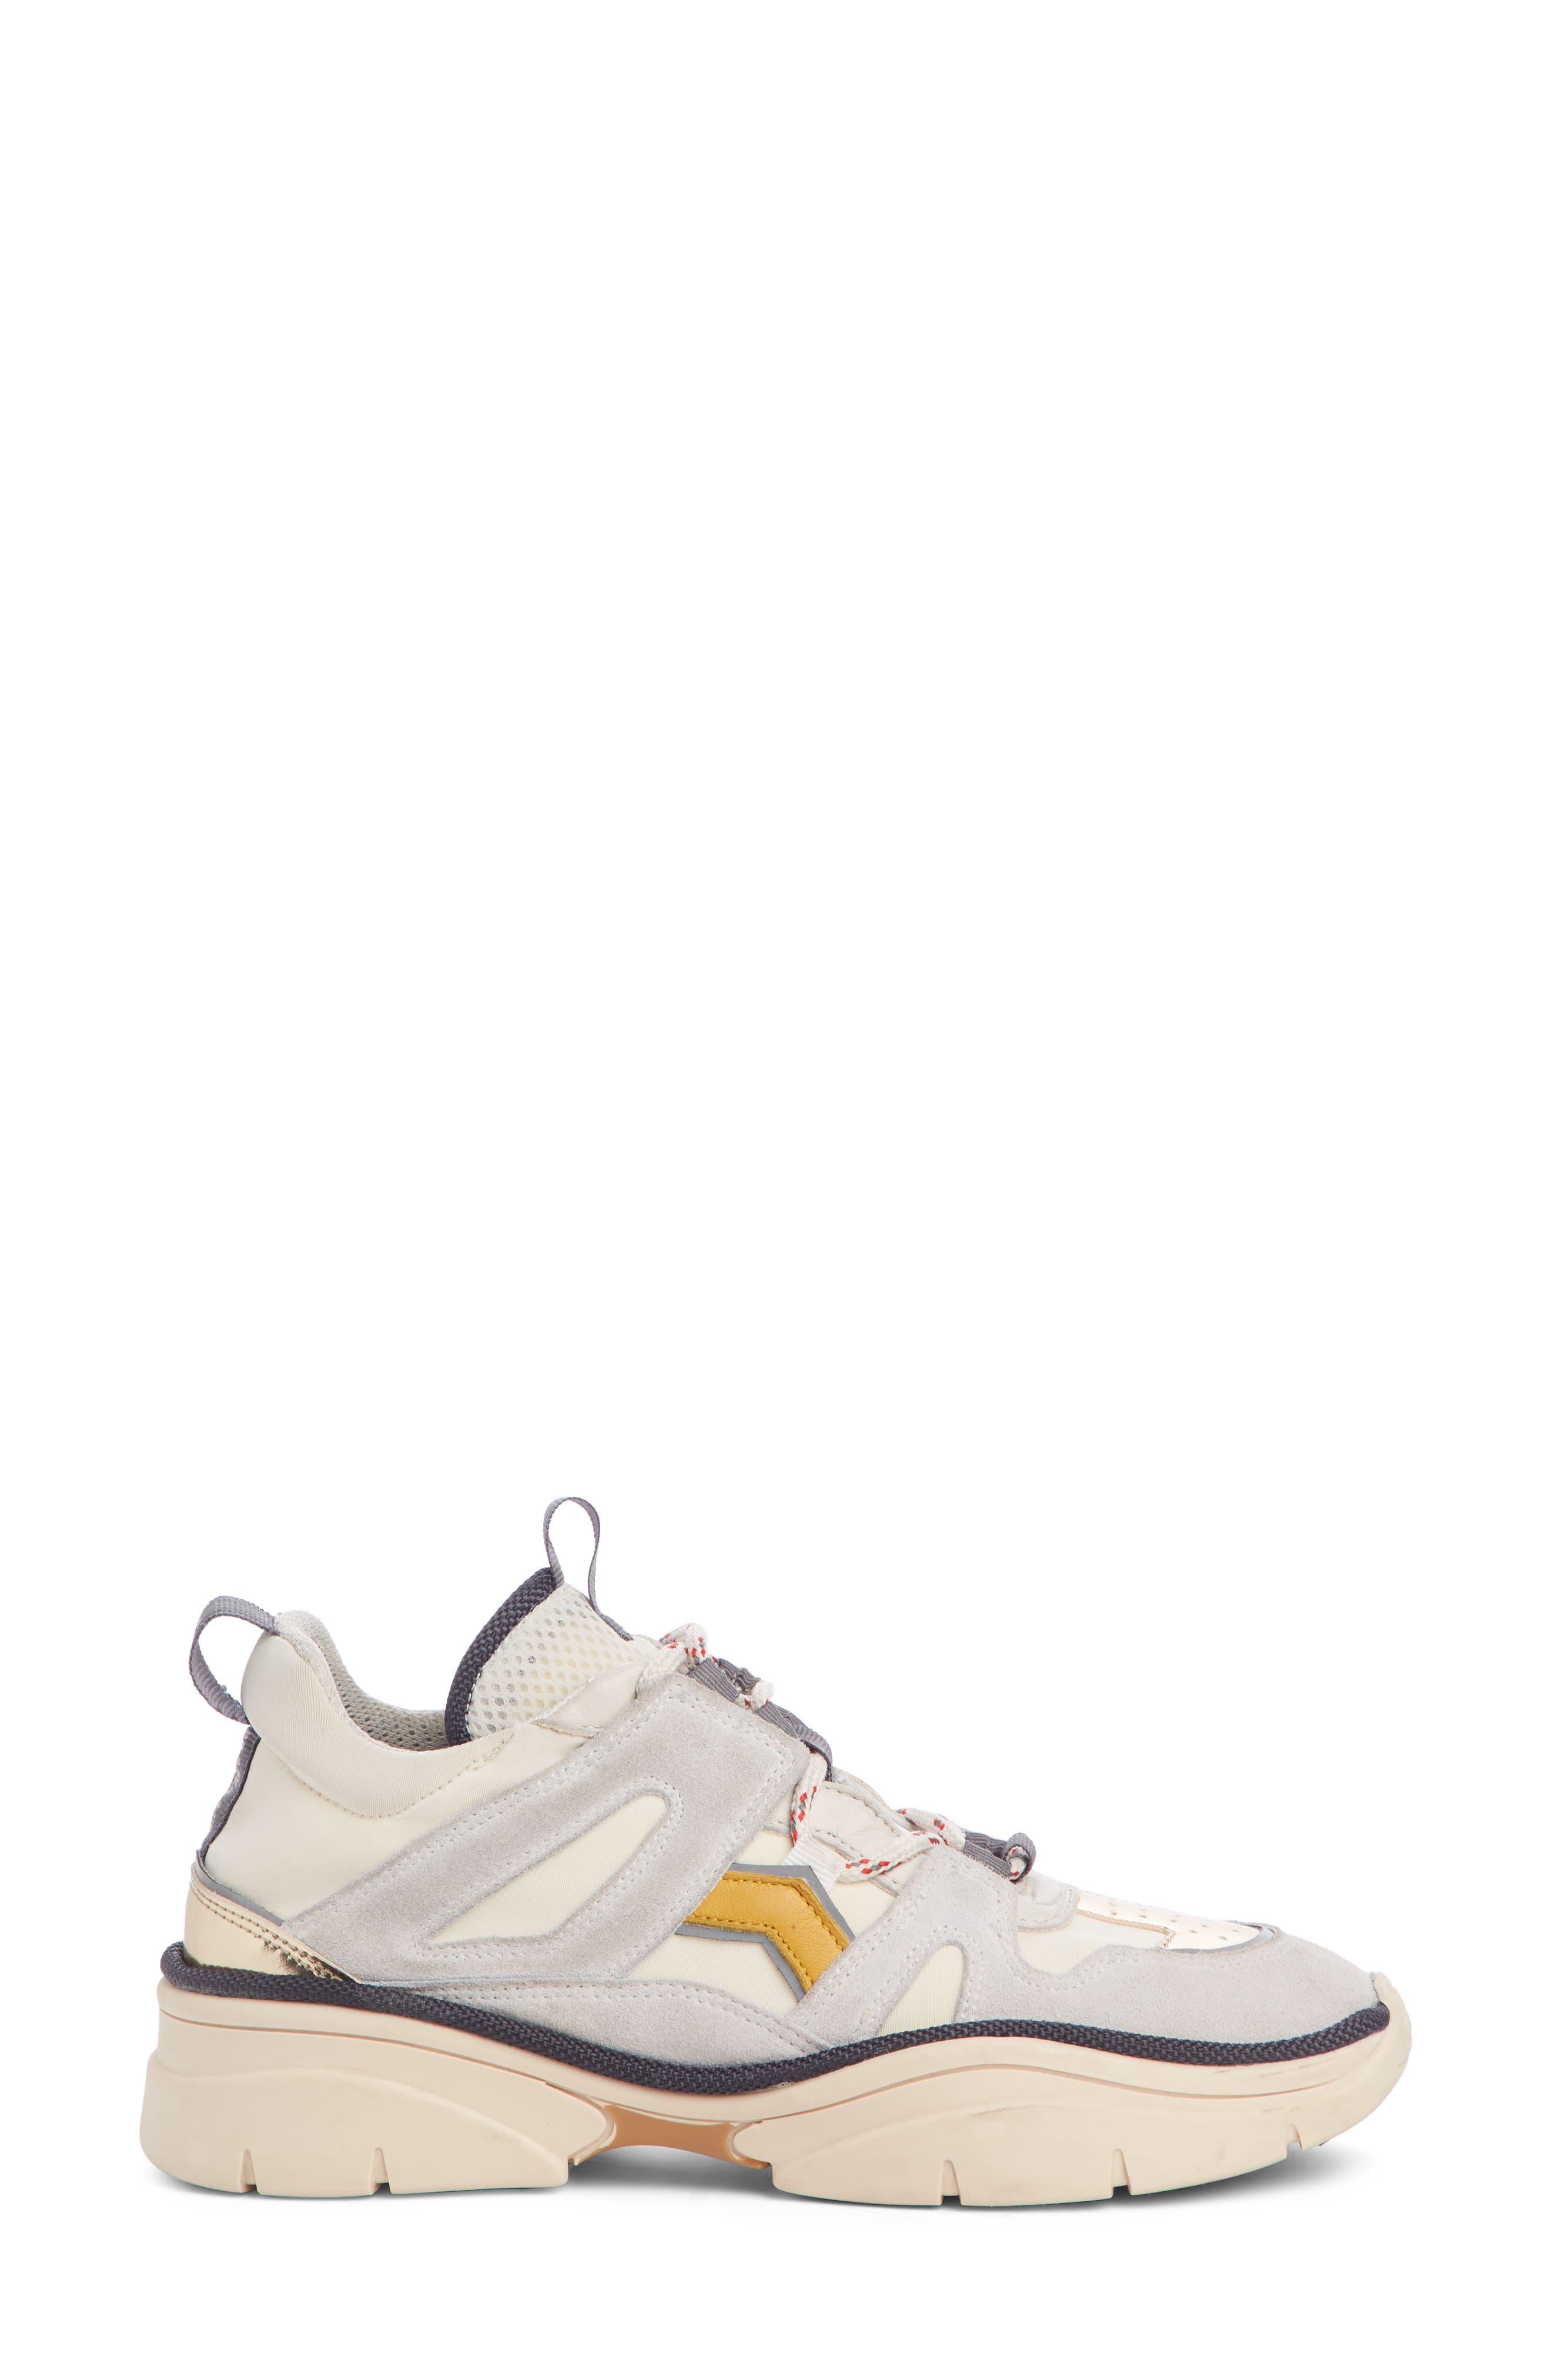 Kindsay Lace-Up Sneaker,                             Alternate thumbnail 3, color,                             WHITE